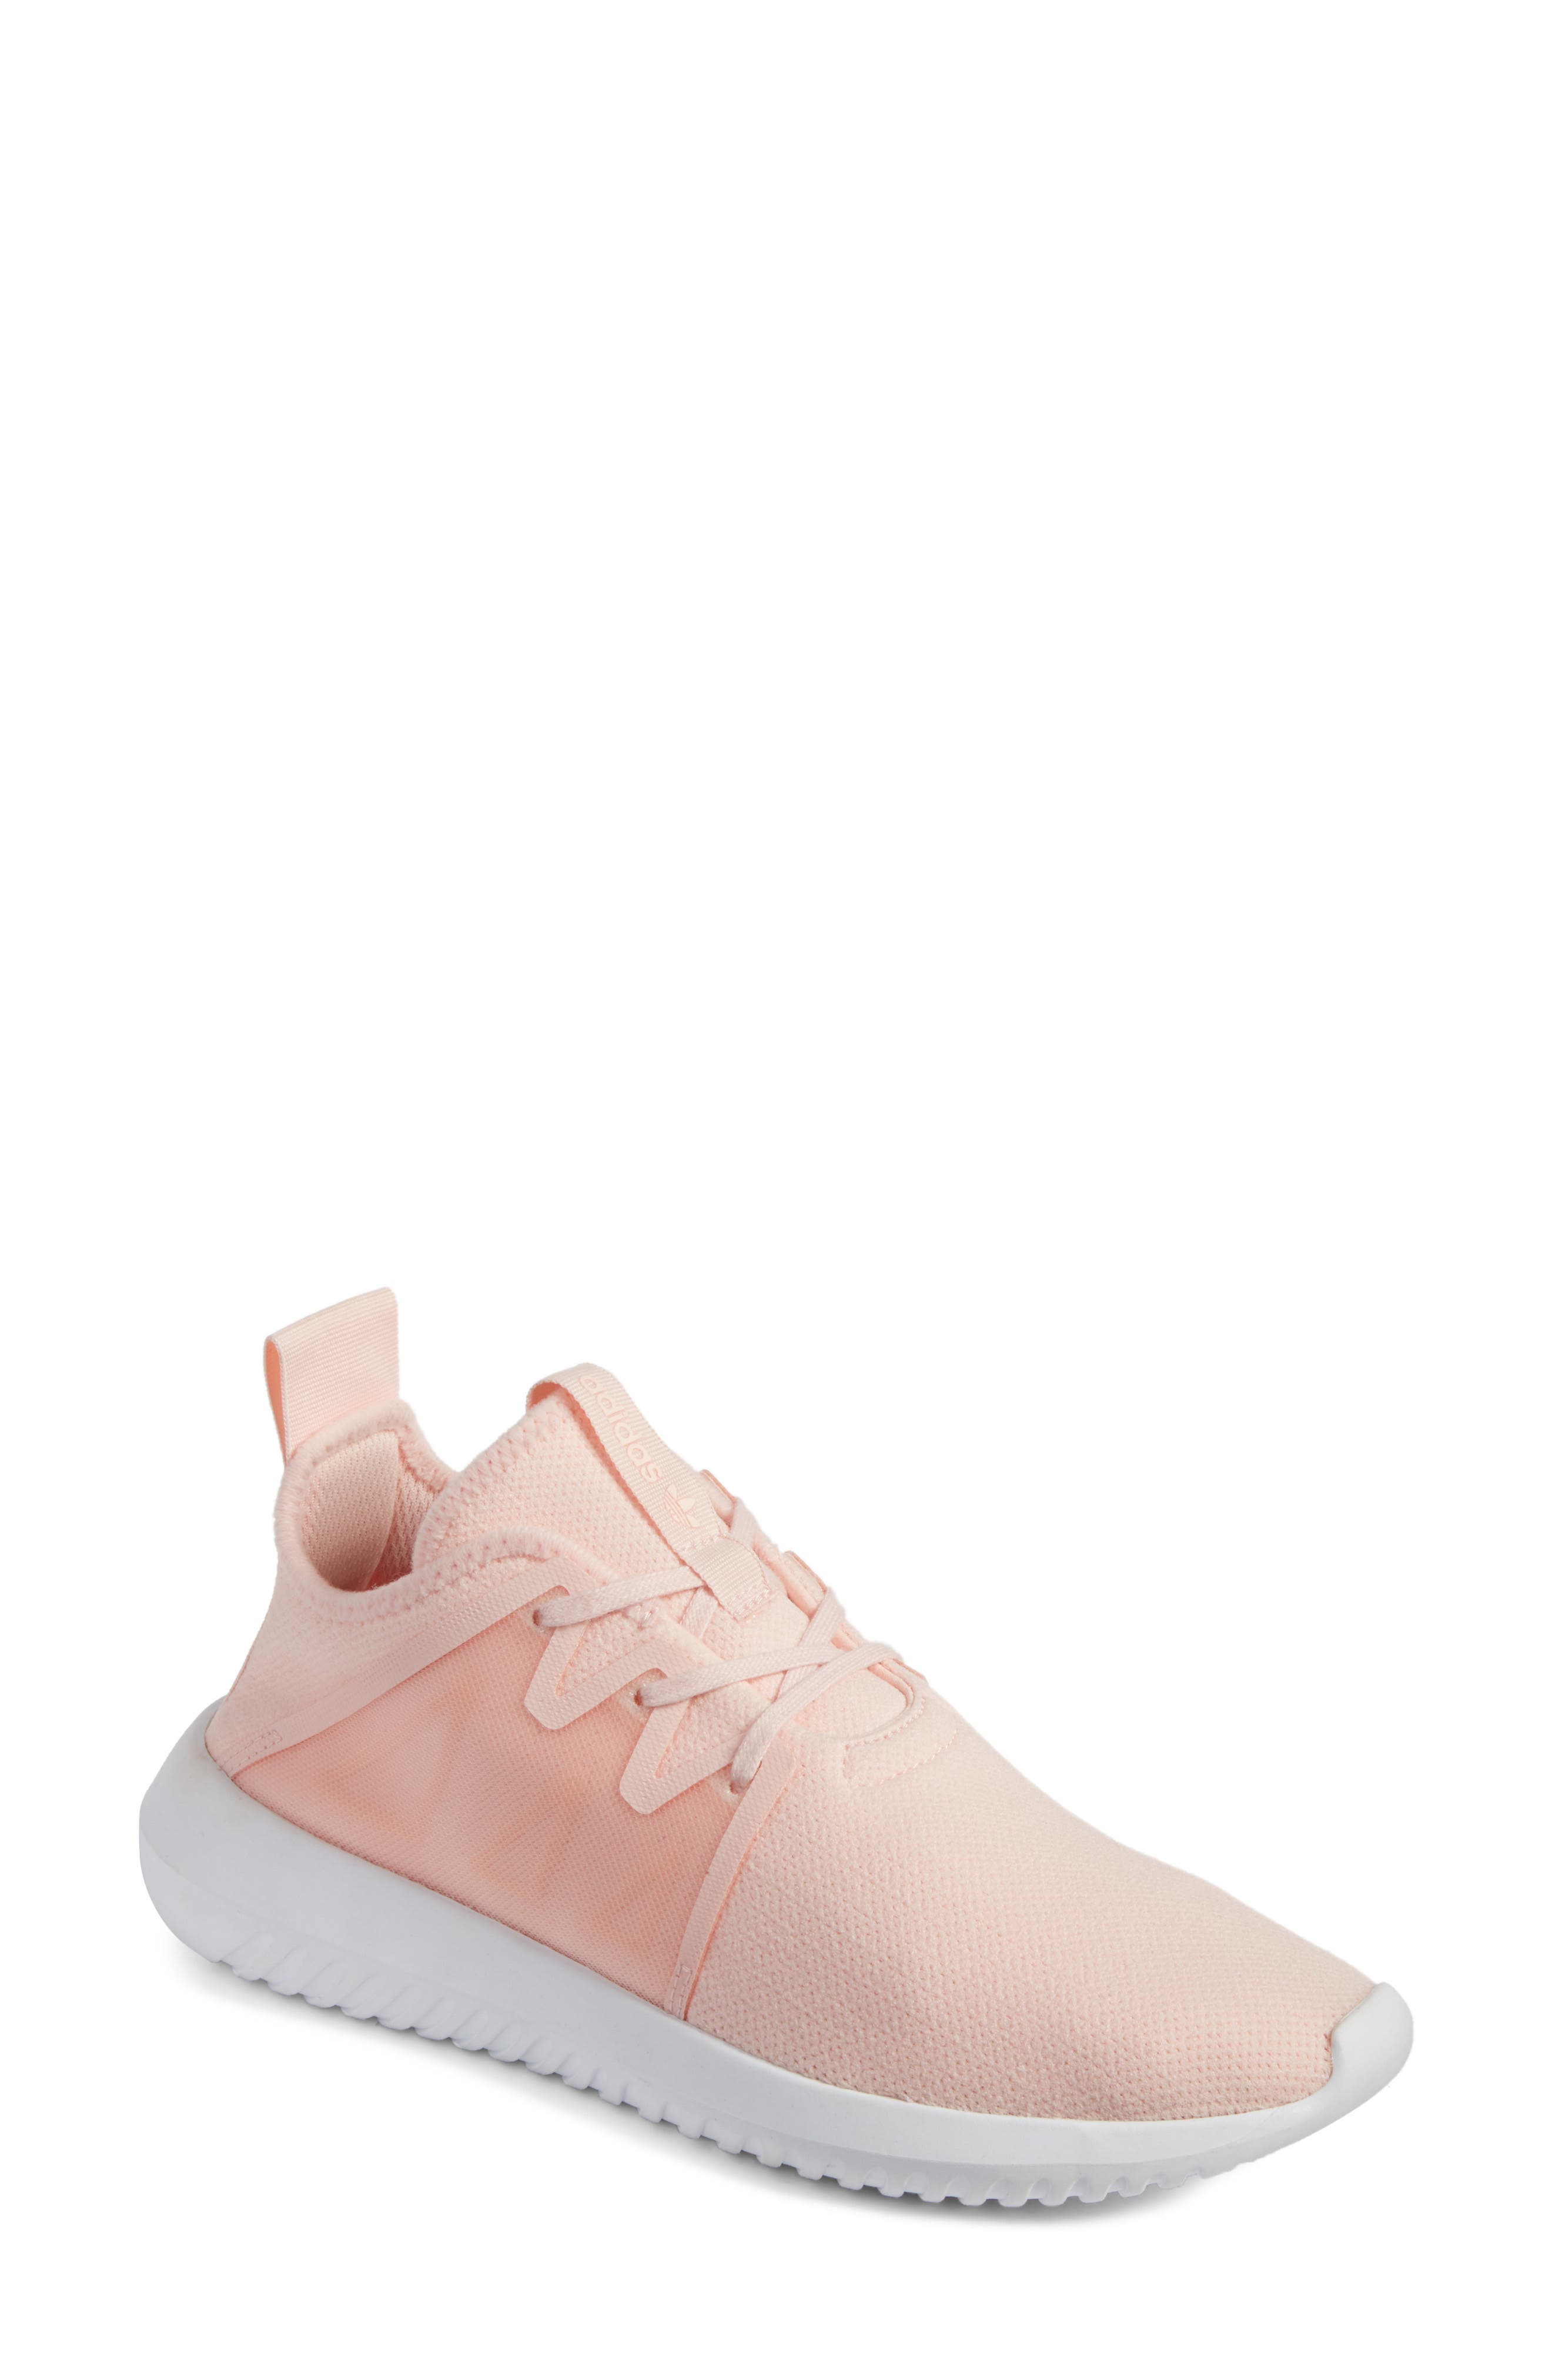 Alternate Image 1 Selected - adidas Tubular Viral 2 Sneaker (Women)